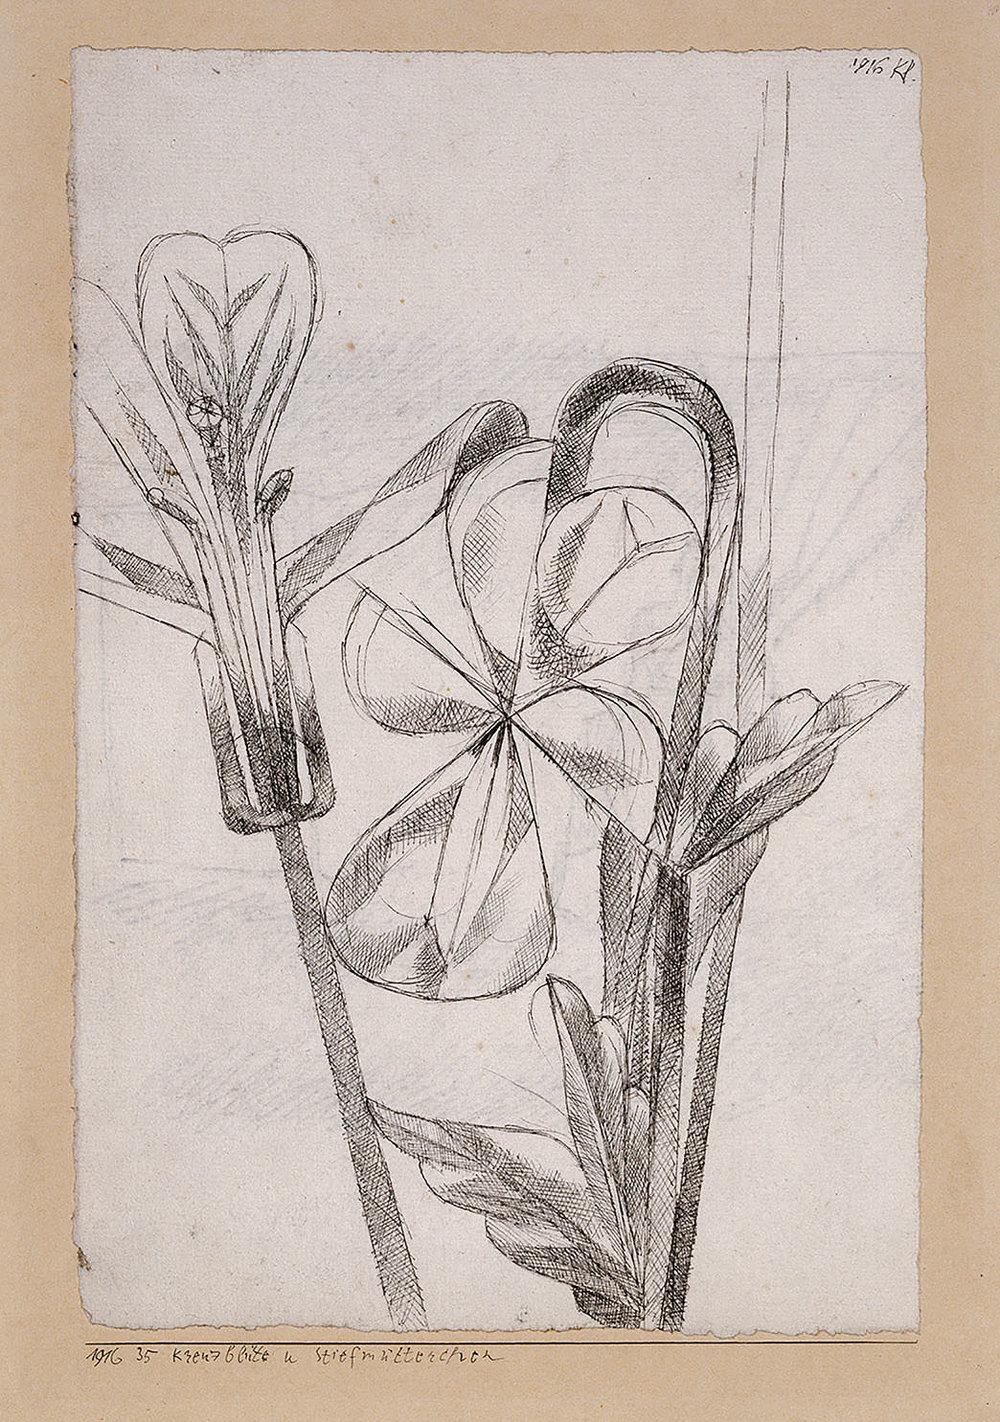 Abb.47 Paul Klee, Kreuzblüte u Stiefmütterchen, 1916, 35 , Feder auf Papier auf Karton , 23,9 x 15,9 cm, Kunstmuseum Basel, Kupferstichkabinett ©Kunstmuseum Basel, Martin P. Bühler